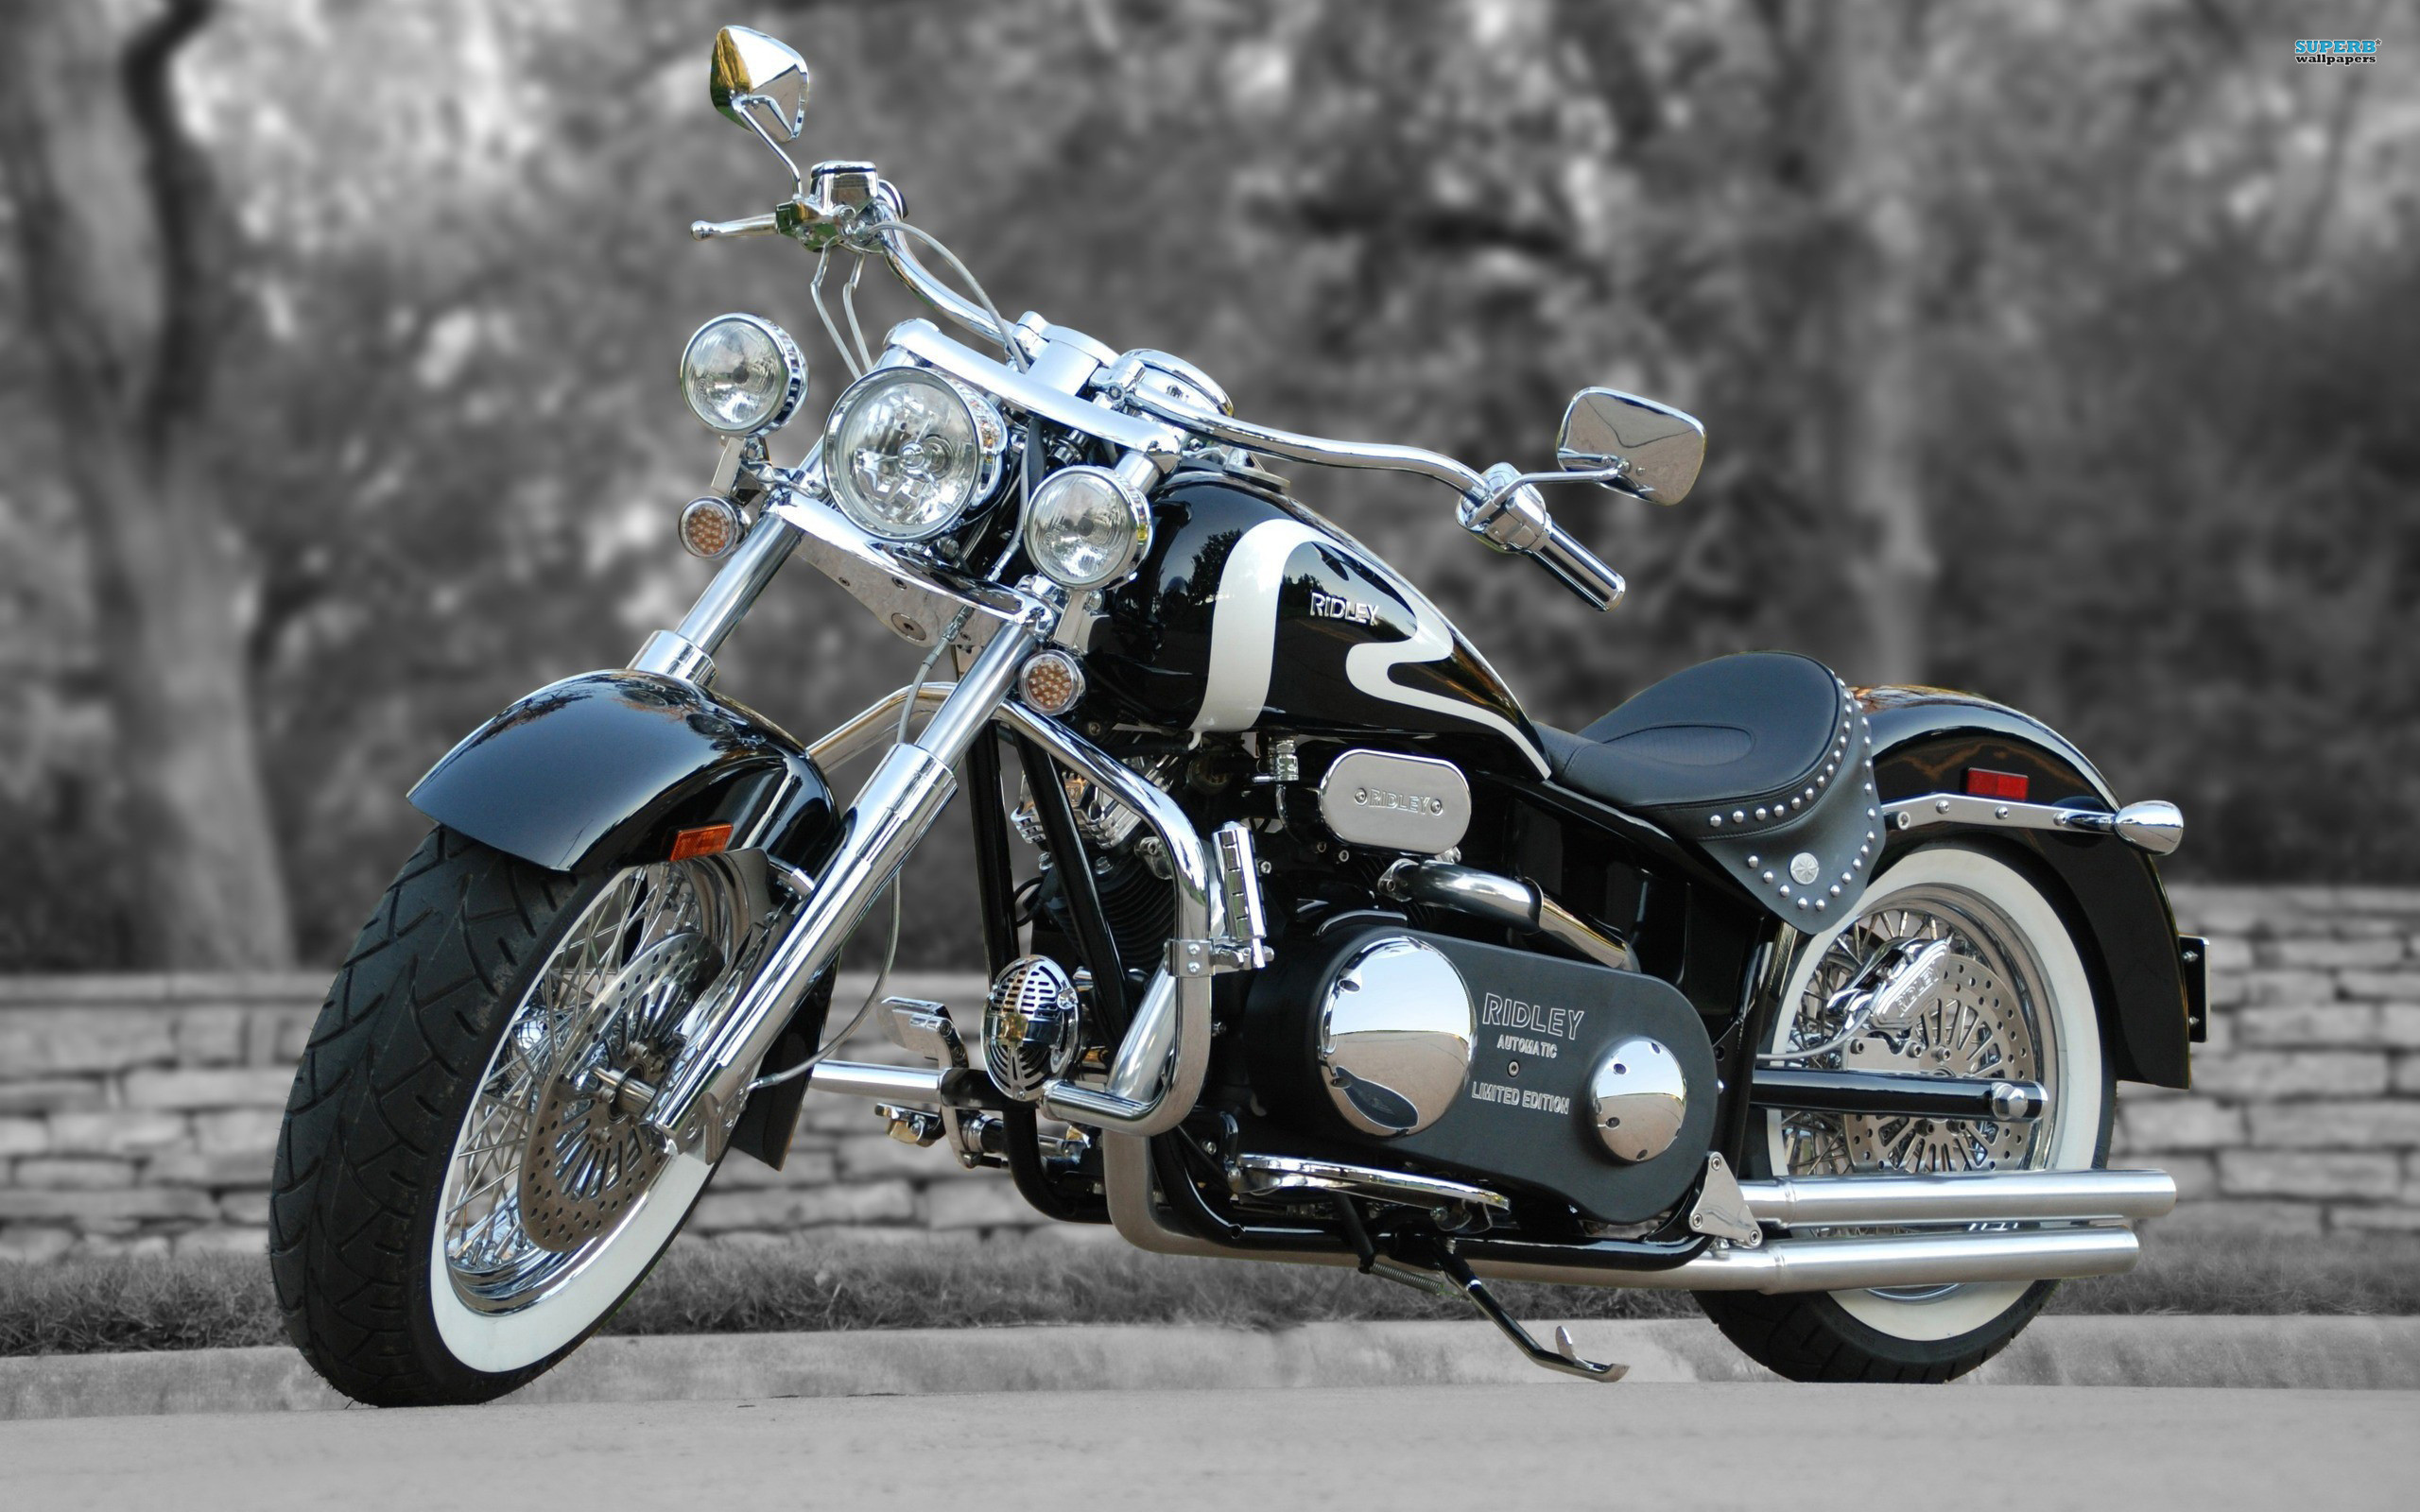 Harley Davidson E Girls Ridley Chopper Motorcycle 897778 2560×1600